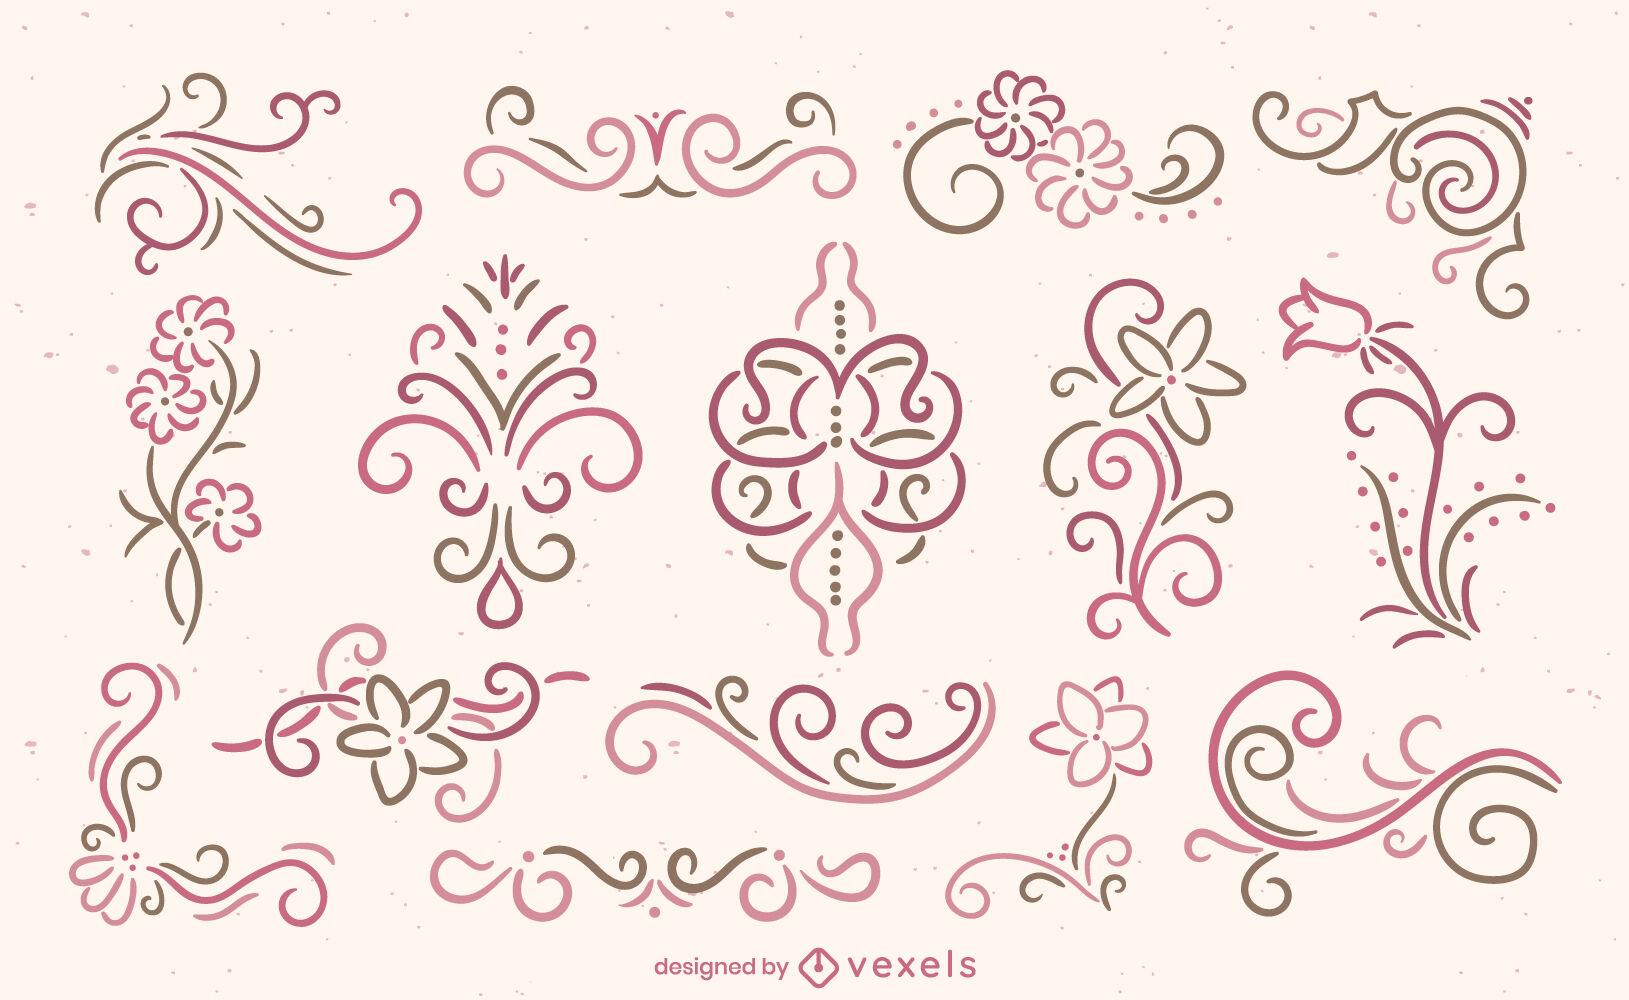 Ornamental flower and swirls decoration